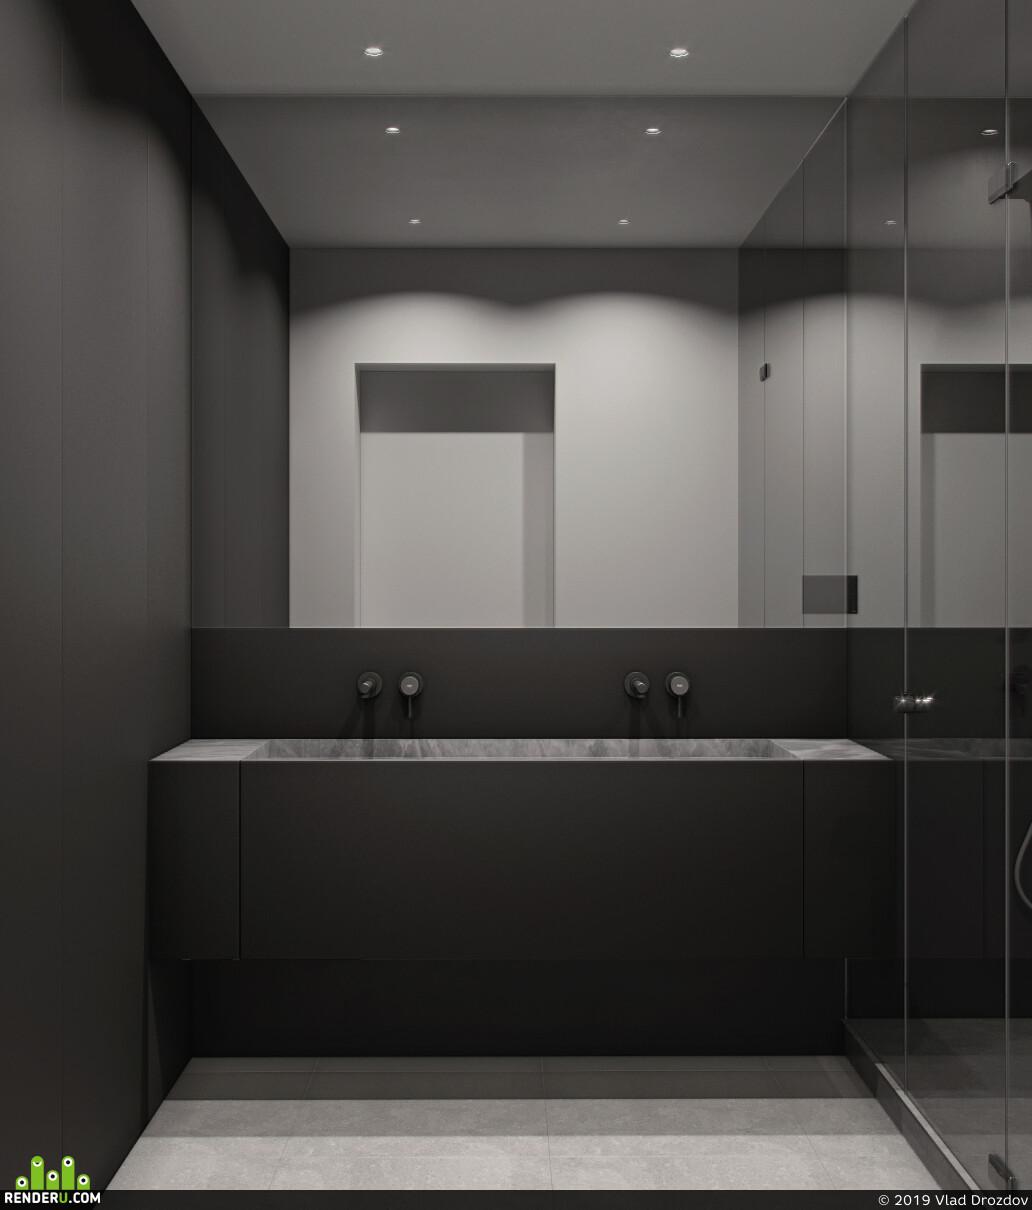 interior, interior design, moderm interior, Interior + Architecture, designer, Corona Renderer, Photoshop